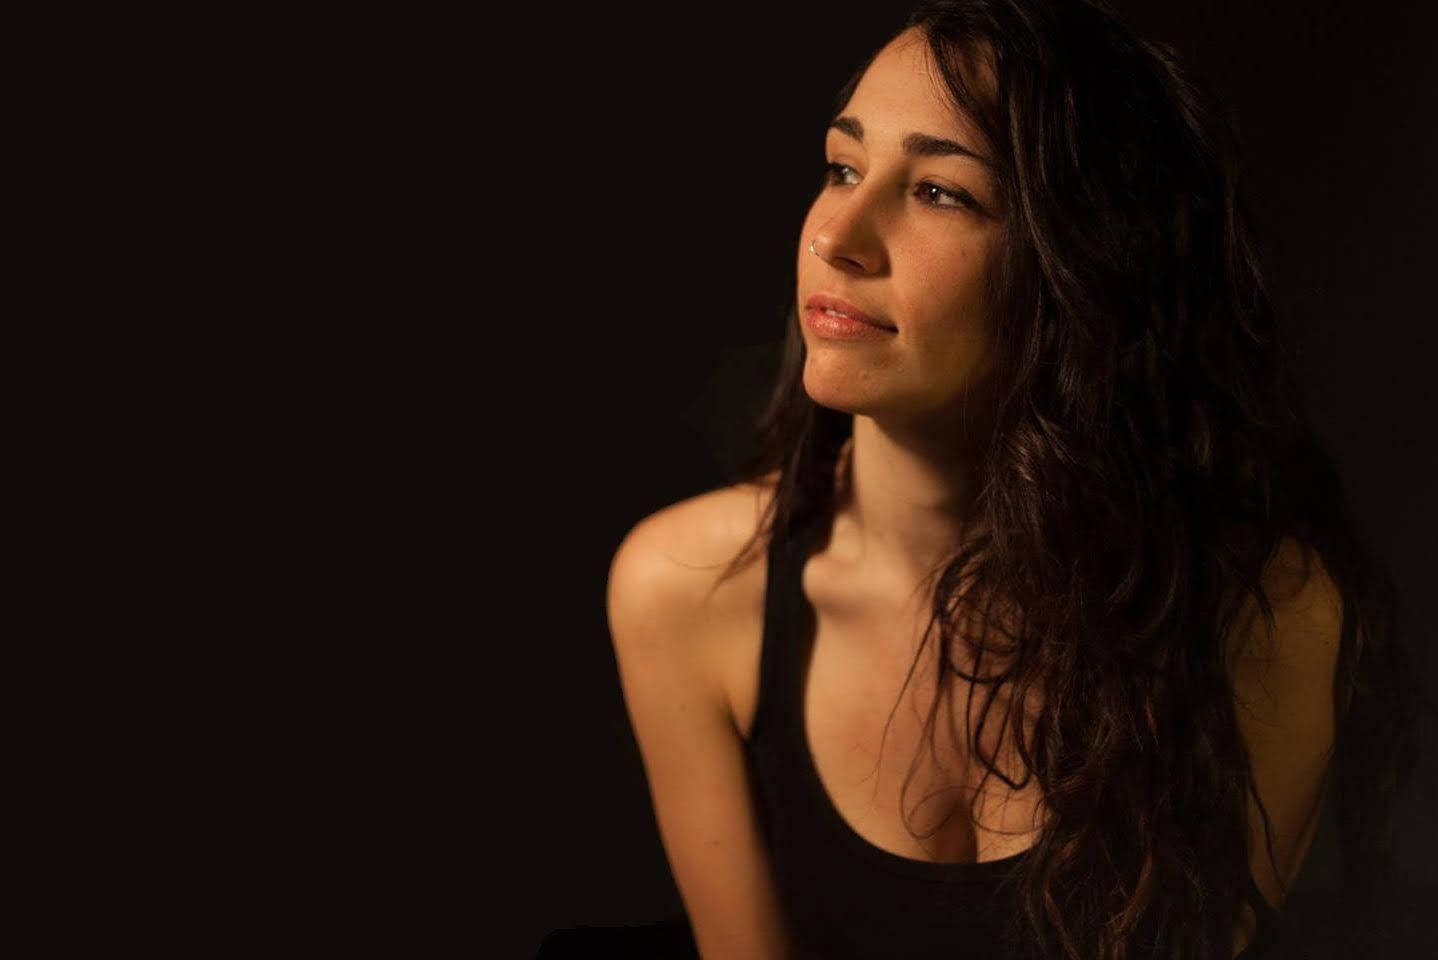 Festival Talent 2016: Laia Badrenas + Javi Garrabella + Claudia Steccato + Pere Pelegrí